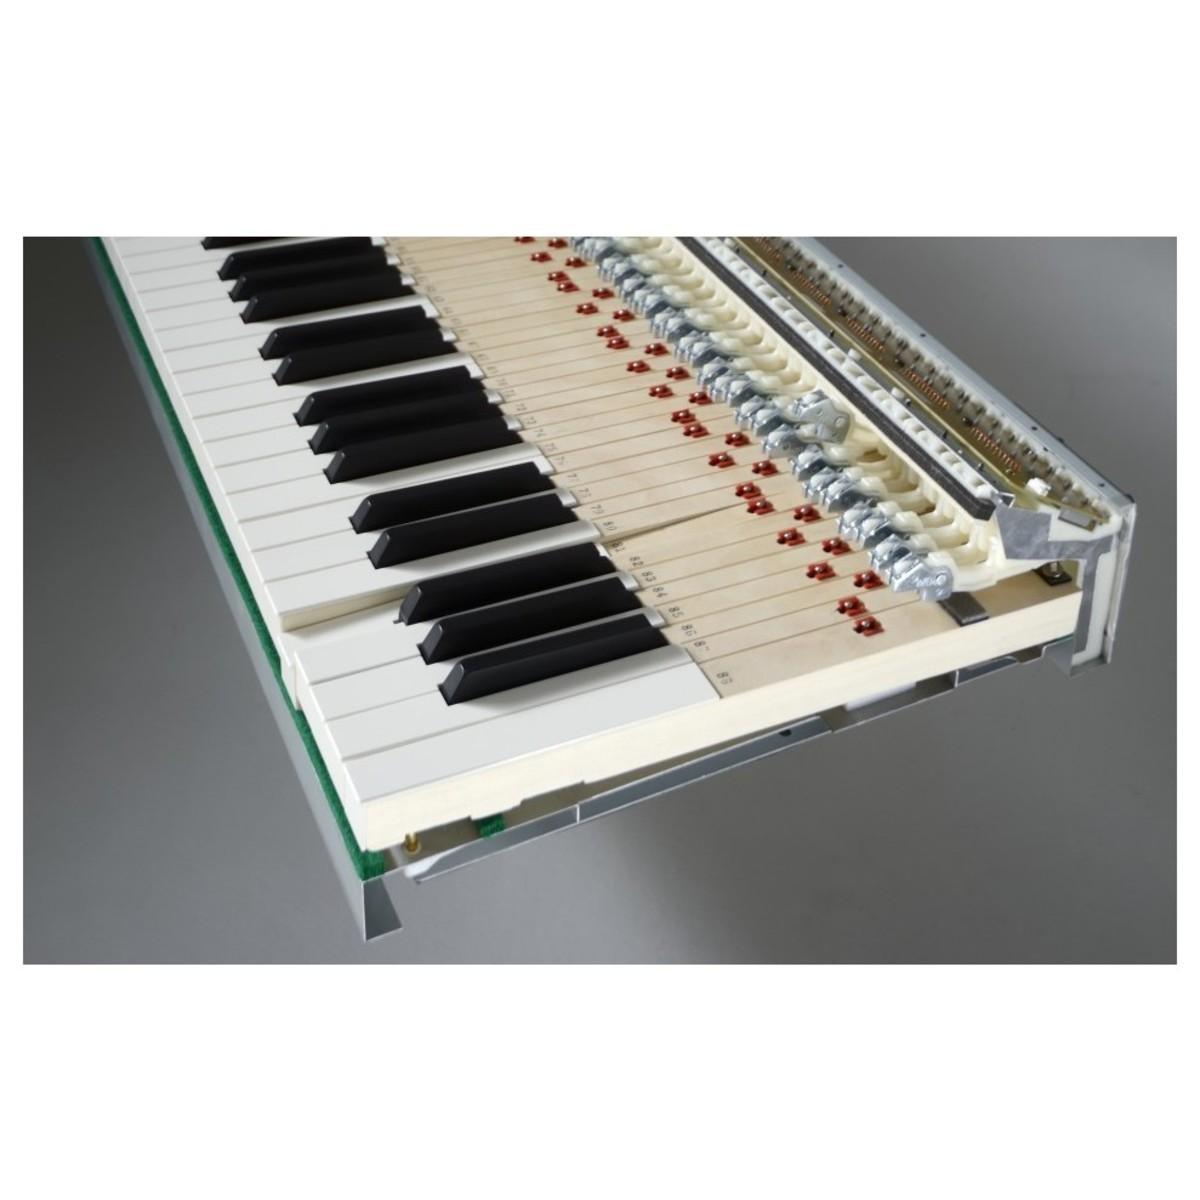 kawai mp11 digital stage piano black b stock at gear4music. Black Bedroom Furniture Sets. Home Design Ideas